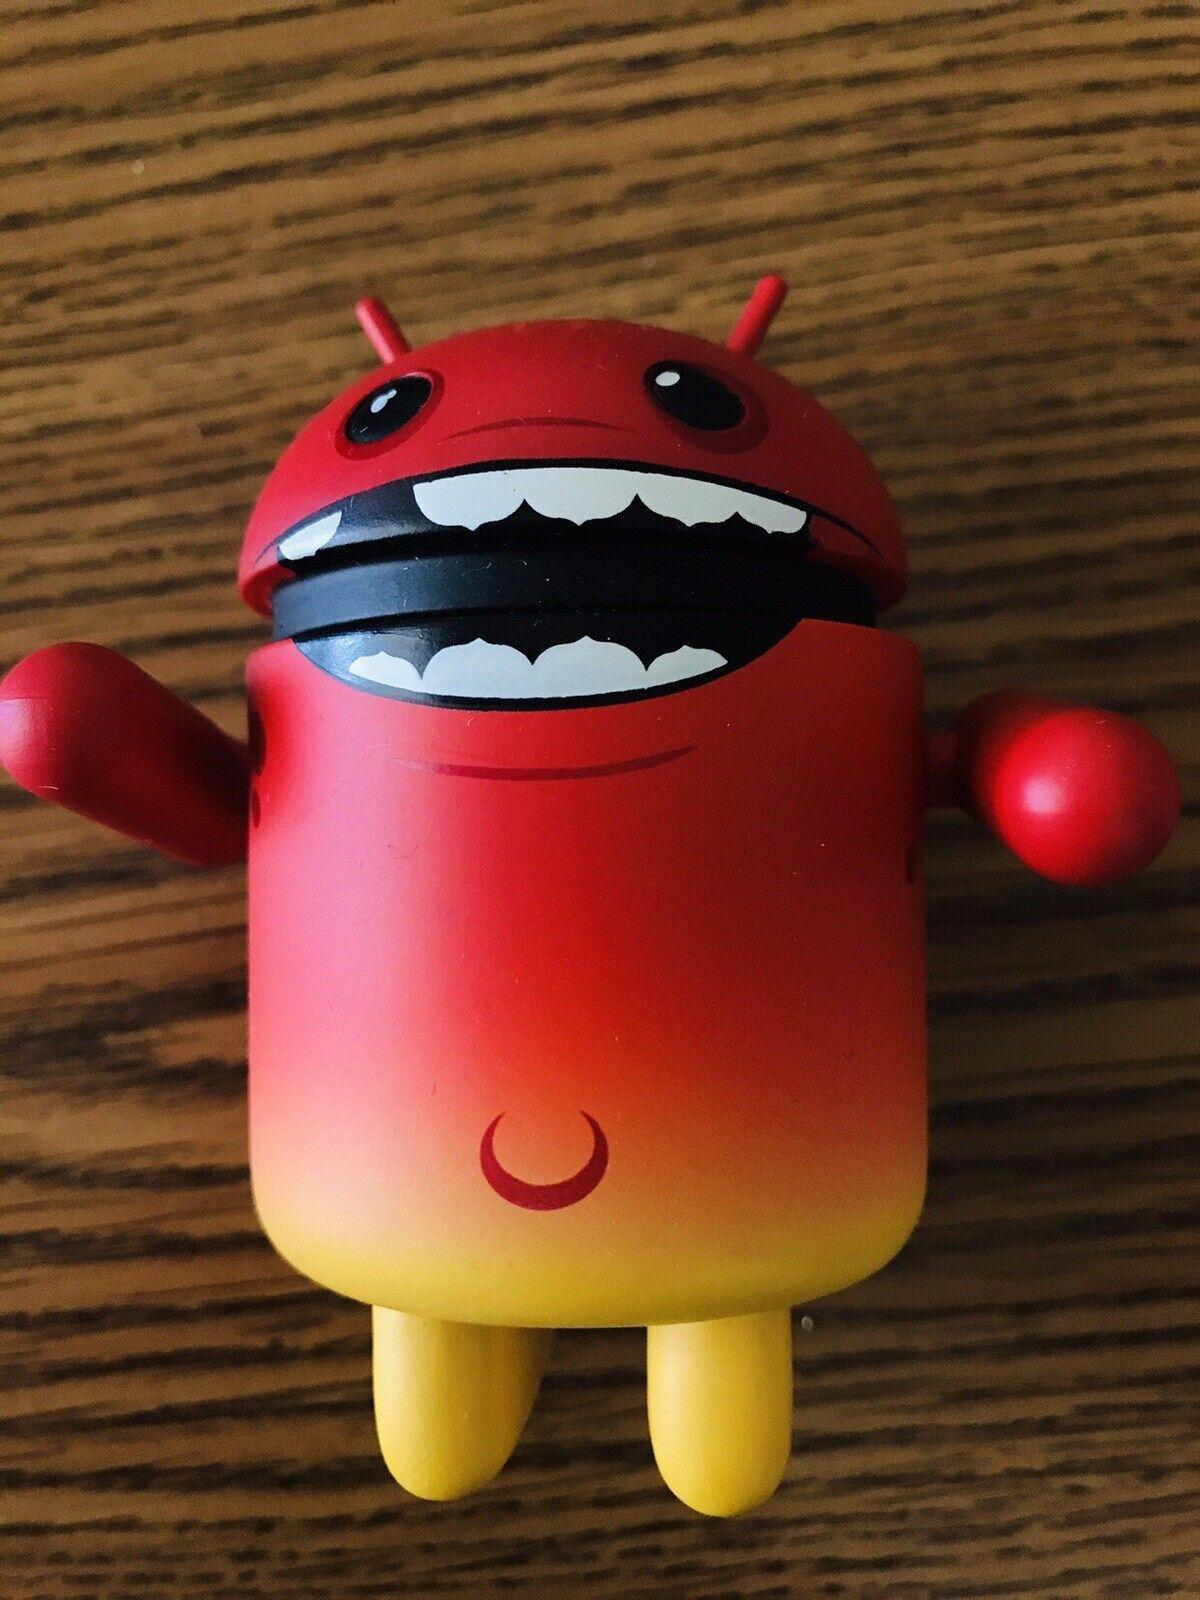 Envío 100% gratuito Súper Rara Rara Rara Figura De Android Mini Coleccionable Serie 1  llama  Andrew Bell  hasta un 60% de descuento